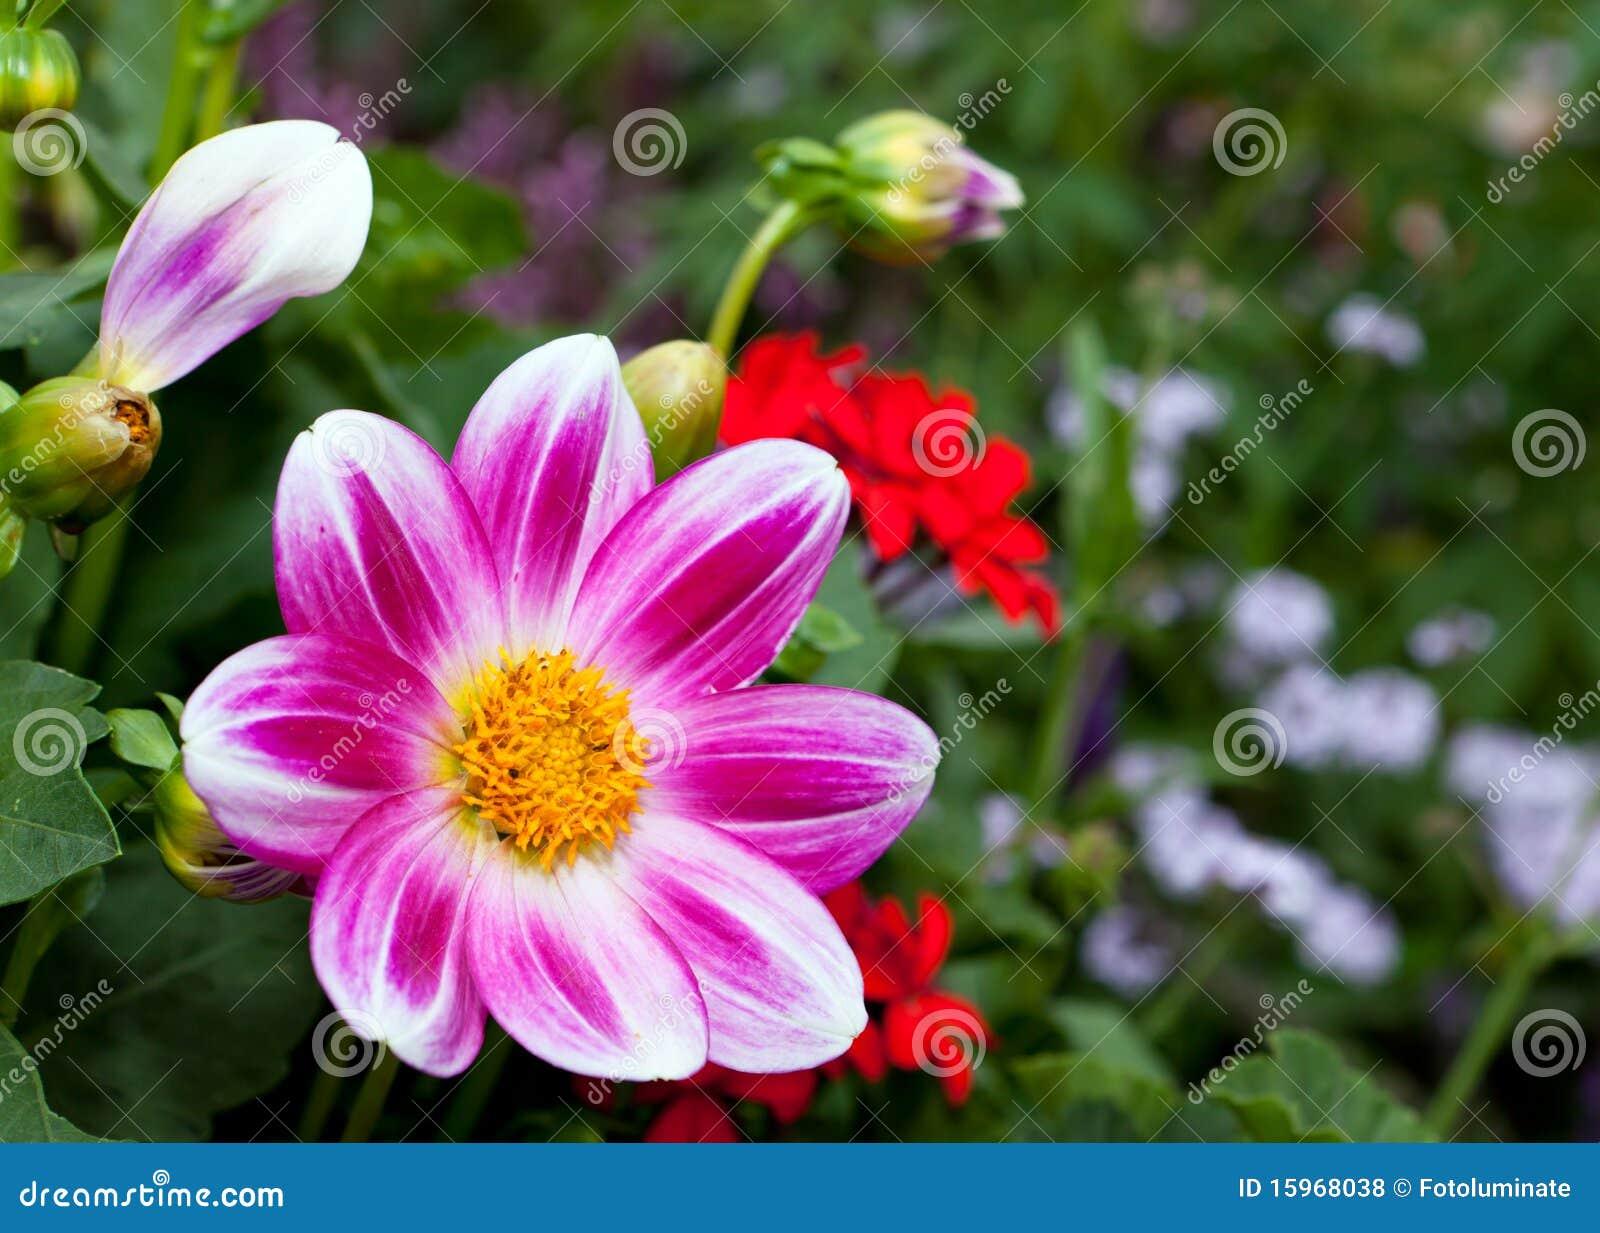 Beautiful purple daisy flower stock photo image of purple yellow beautiful purple daisy flower izmirmasajfo Choice Image